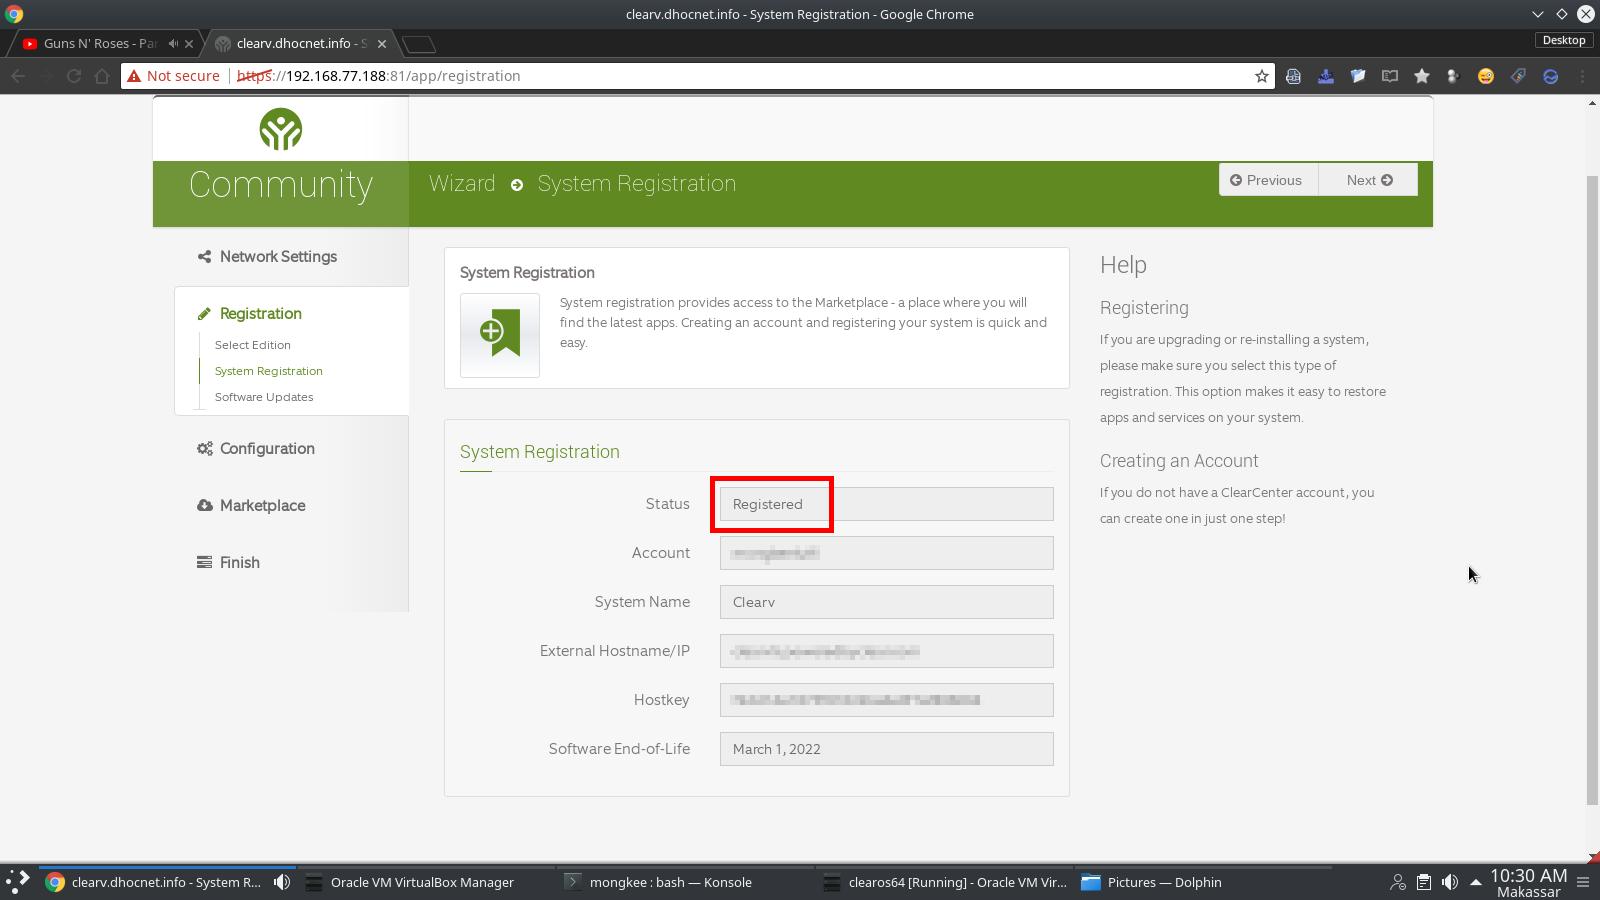 Instalasi ClearOS 7 Linux Community Edition – Konfigurasi Lanjutan